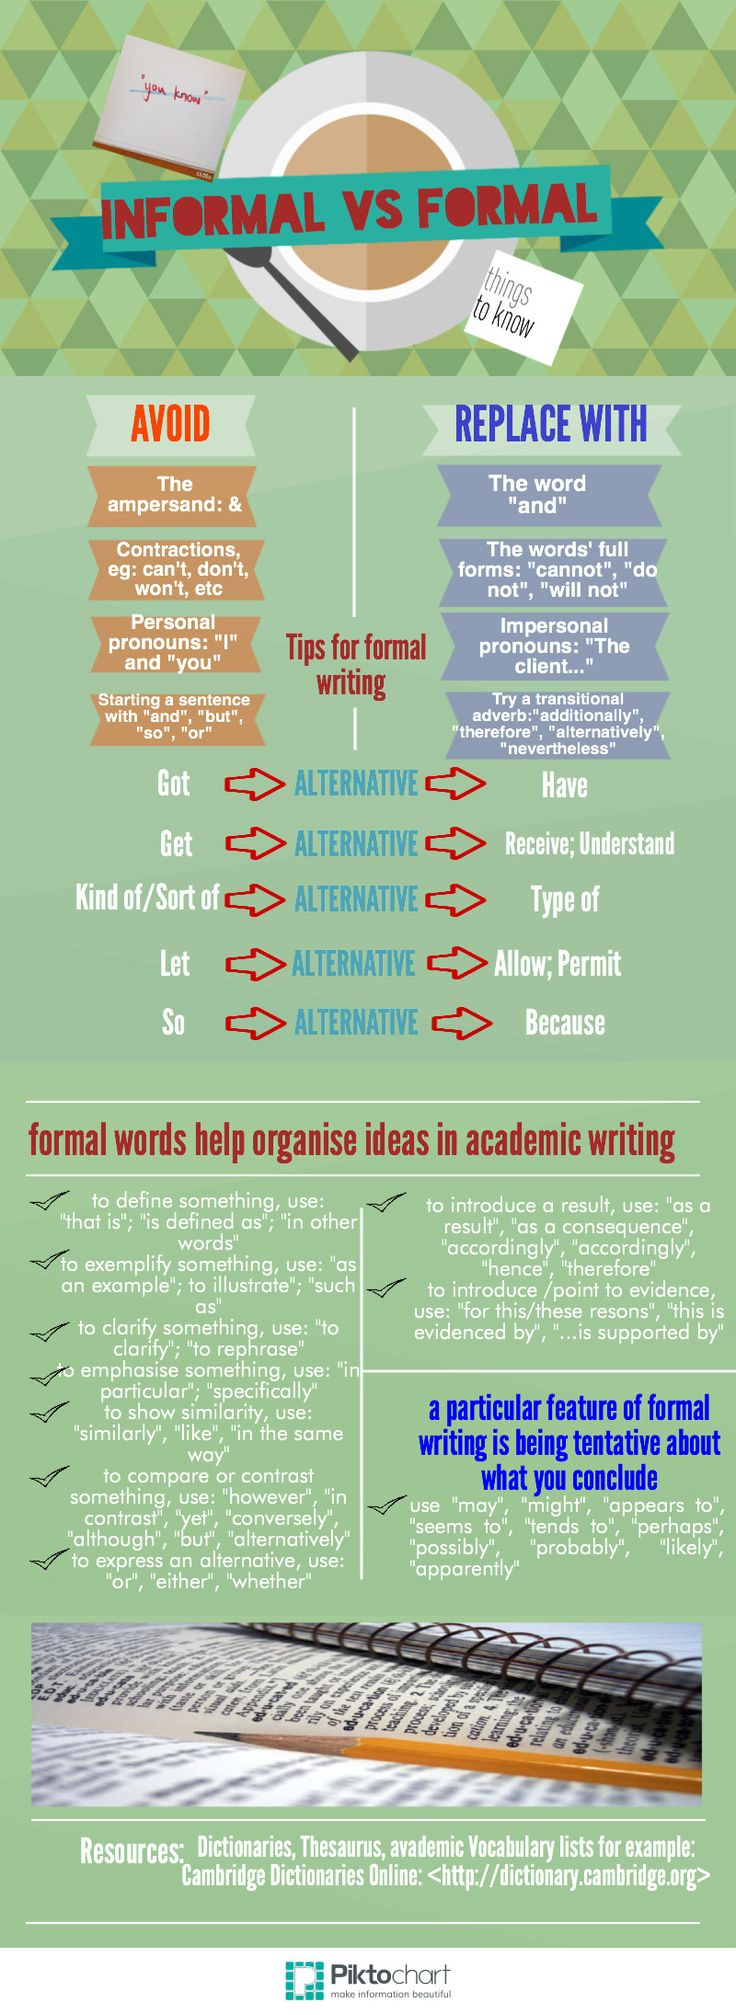 Informal vs Formal | Piktochart Infographic Editor